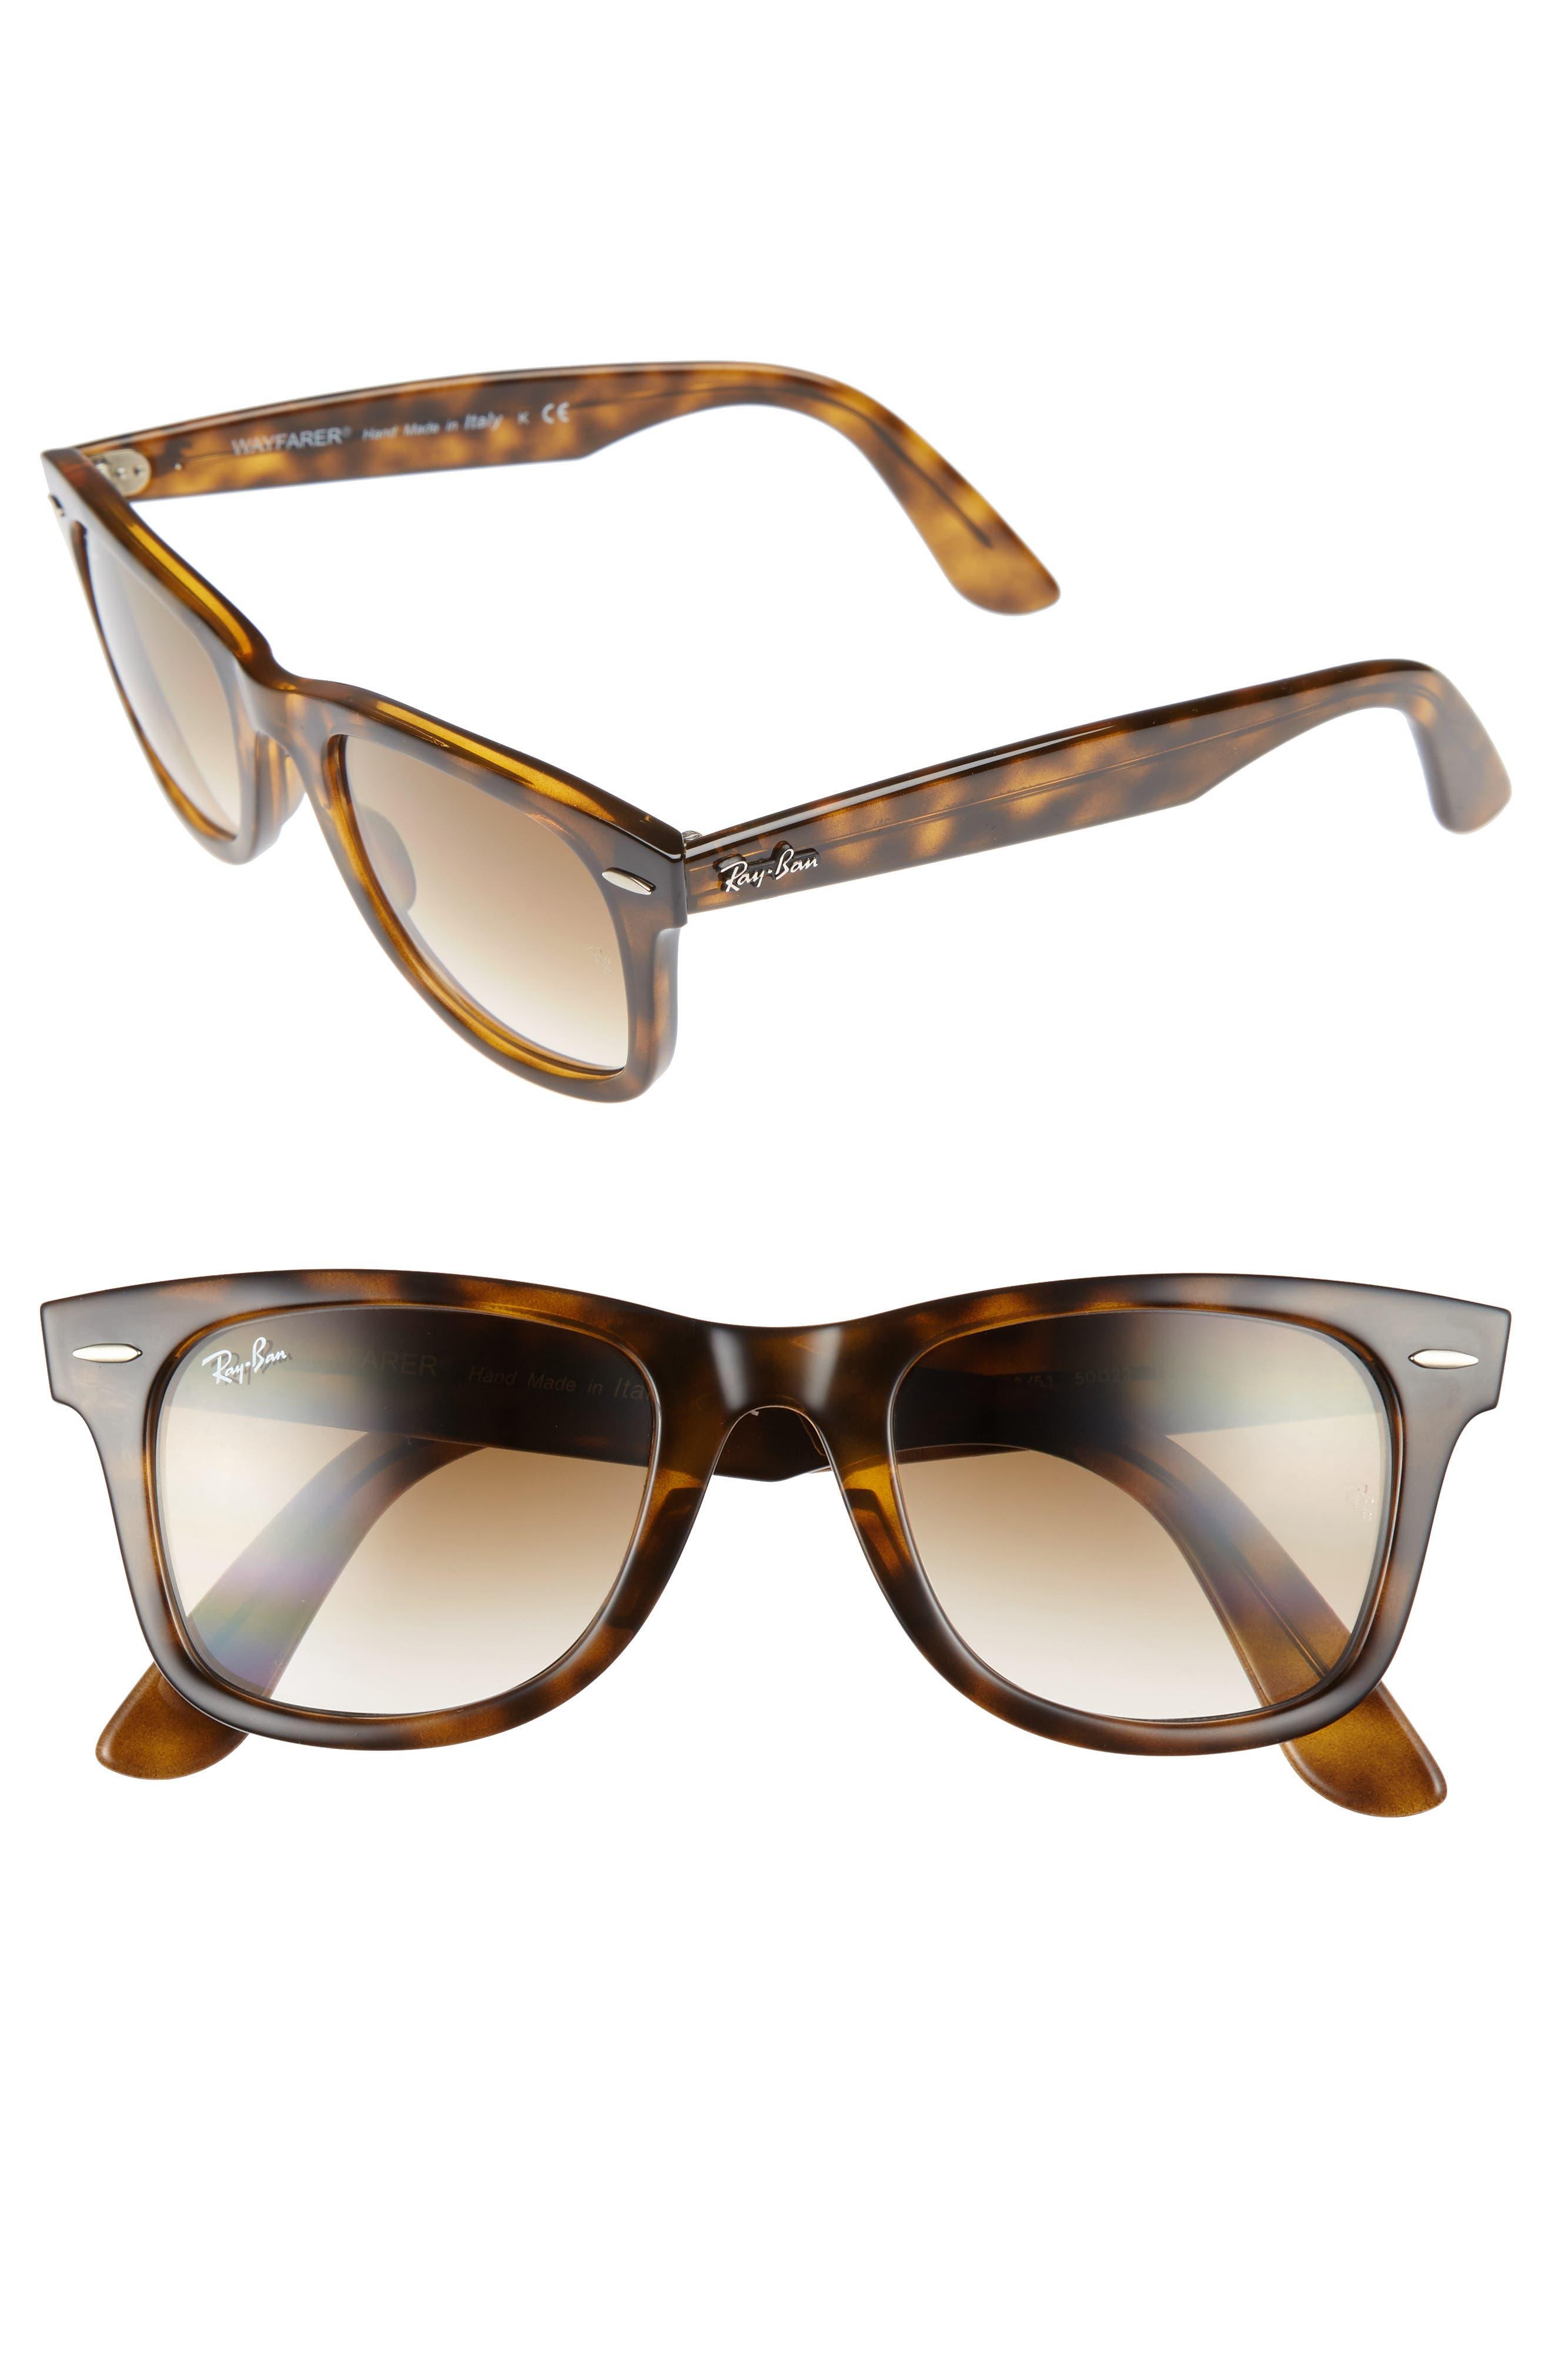 50mm Wayfarer Ease Gradient Sunglasses,                         Main,                         color, Light Havana